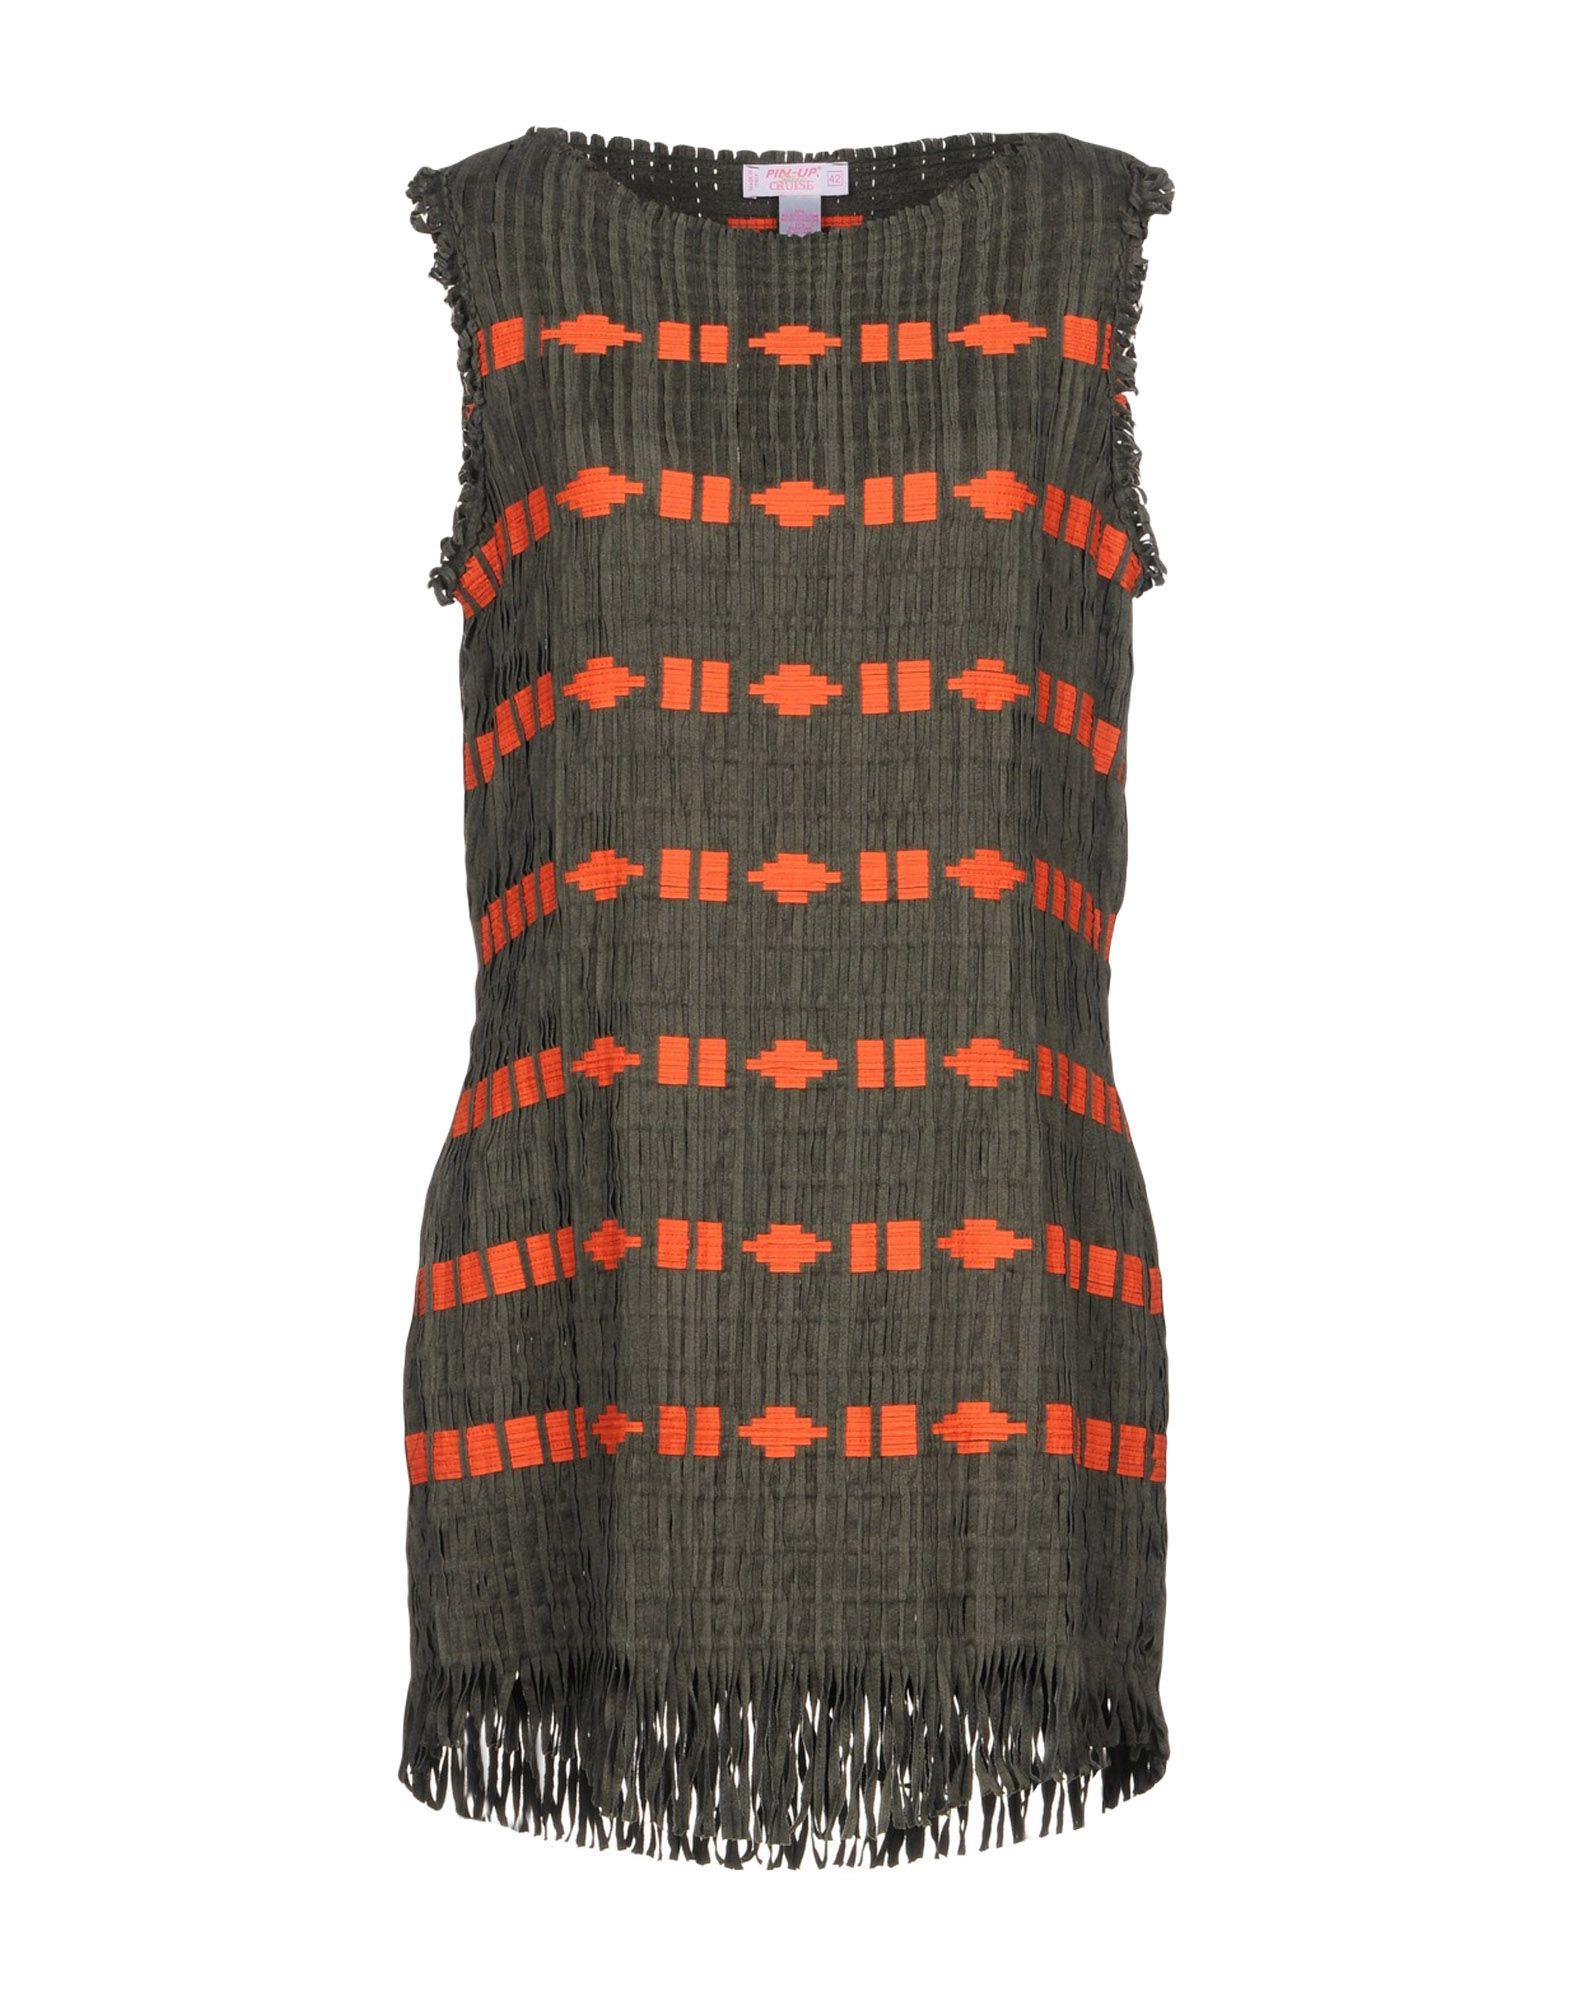 6fcaf733ef9e PIN UP - Κορυφαία προϊόντα για ολοκληρωμένα Outfit